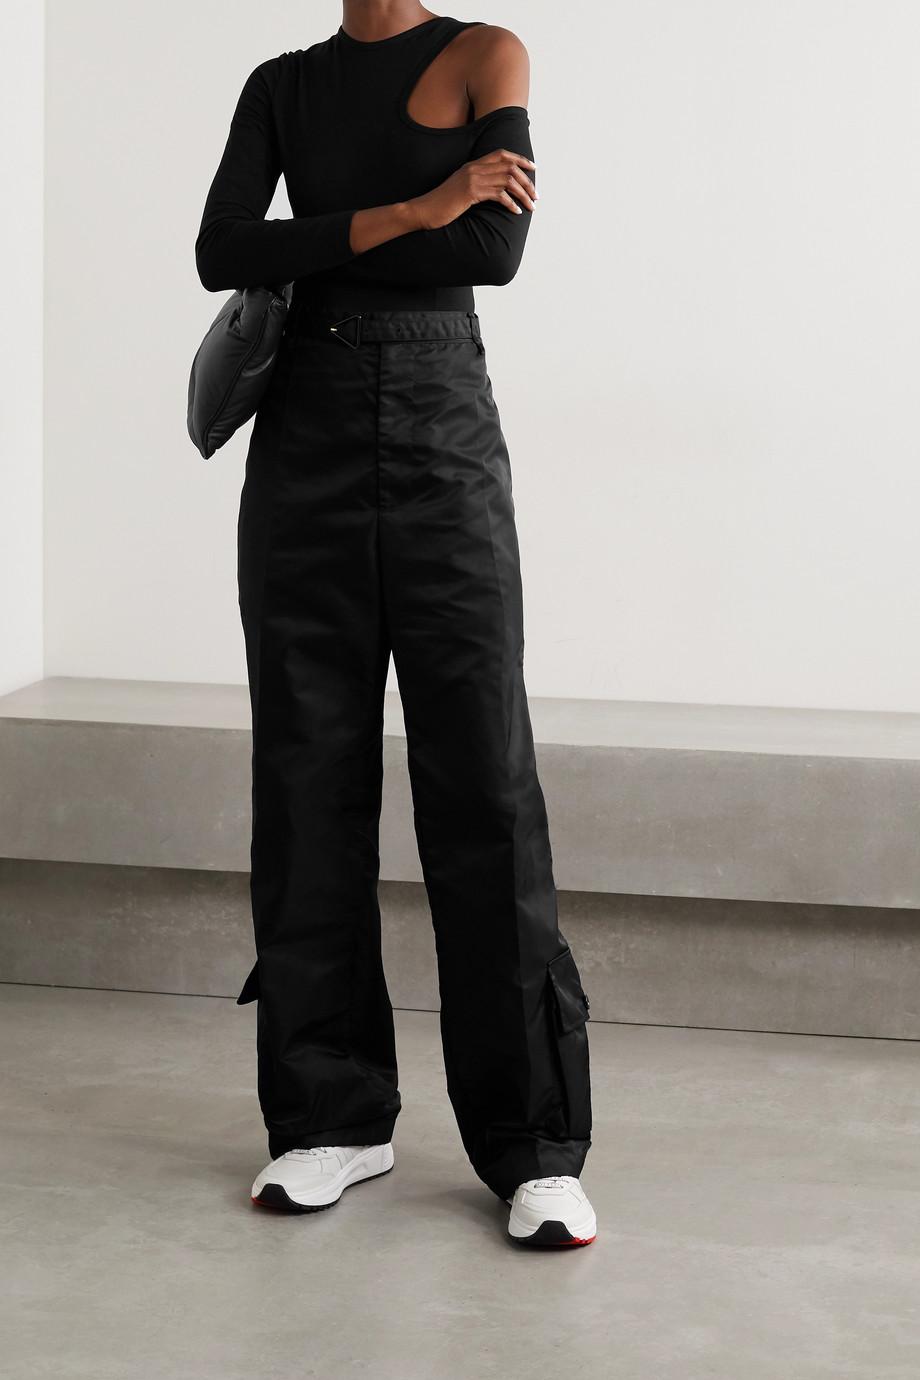 Ninety Percent + NET SUSTAIN cutout stretch-TENCEL jersey bodysuit